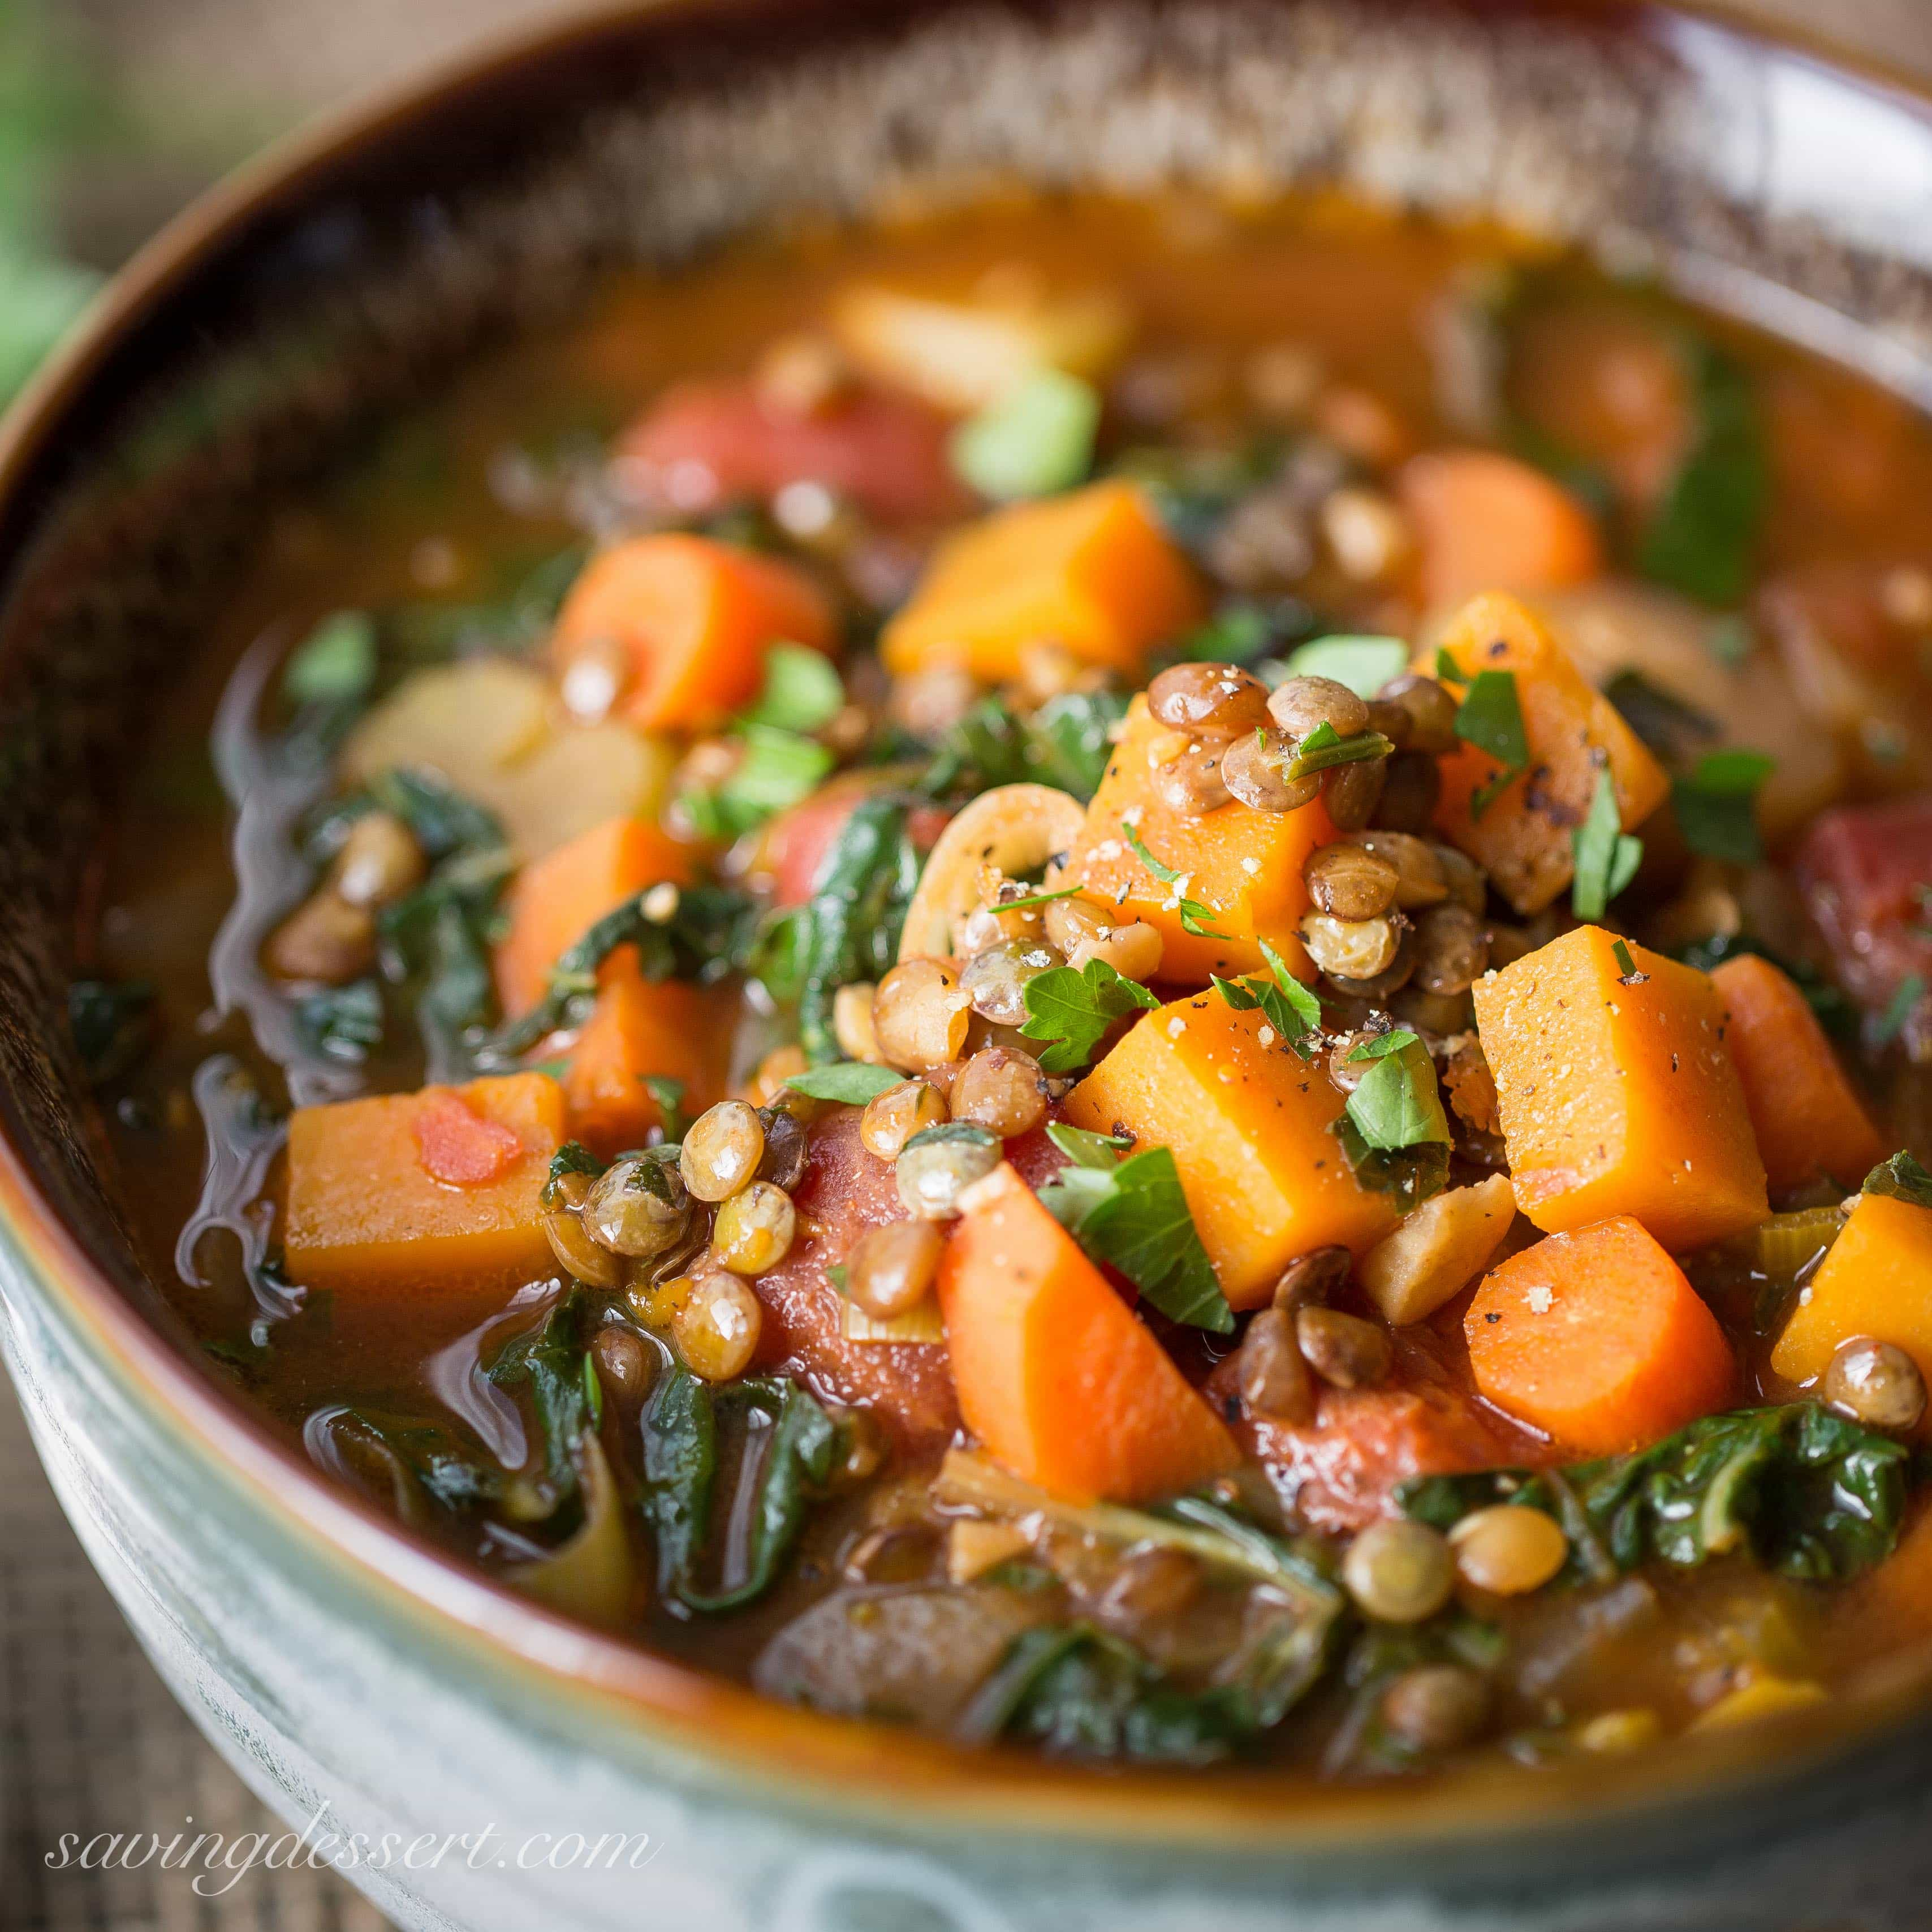 Vegetable Soup With Lentils & Seasonal Greens